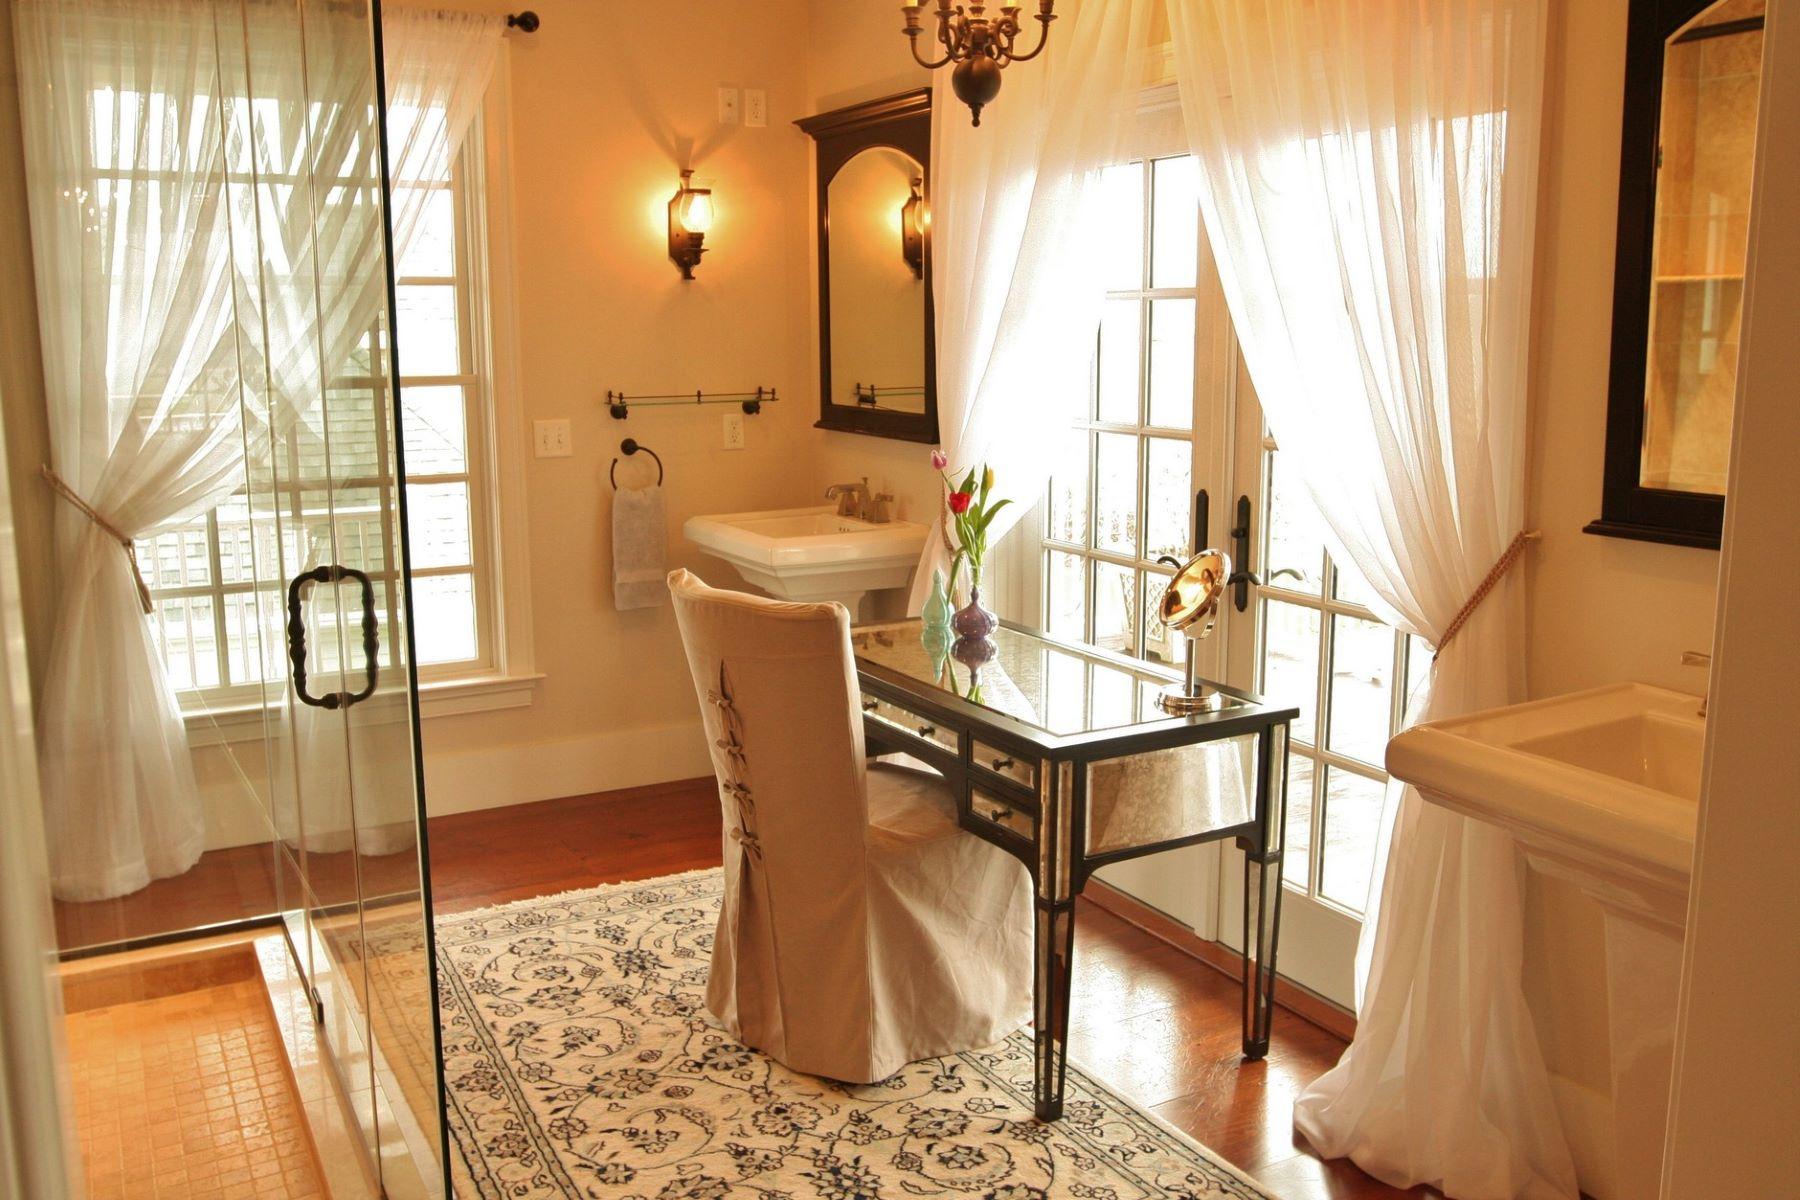 Additional photo for property listing at Swan Creek 20645 Jamieson Rd, Rock Hall, Maryland 21661 Amerika Birleşik Devletleri